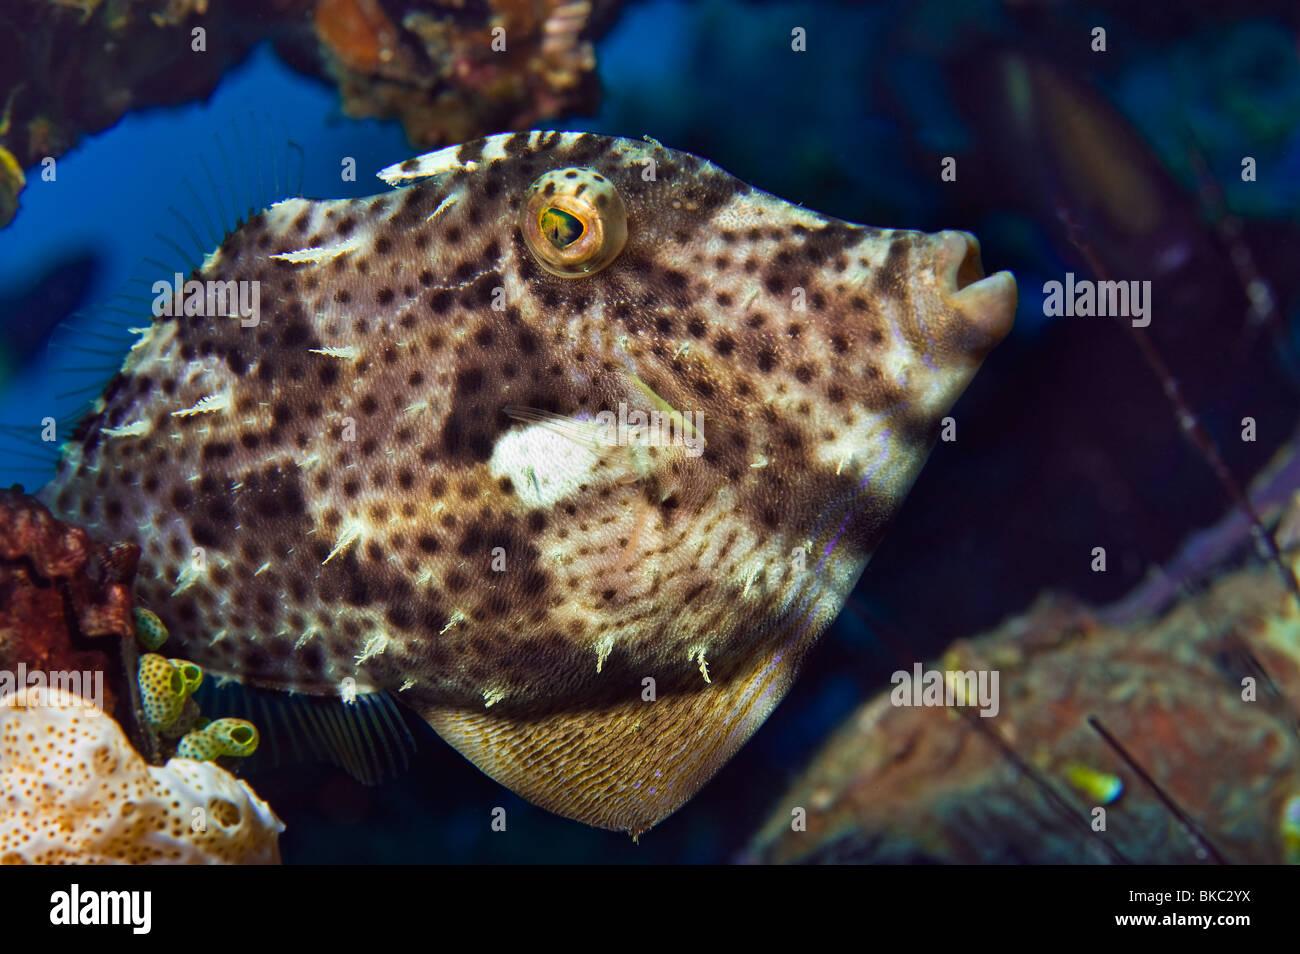 Leather jacket insect - Reef Radial Leatherjacket Filefish File Fish Acreichthys Radiatus Monacanthidae Malapascua Under Water Sea Malapascua Stock